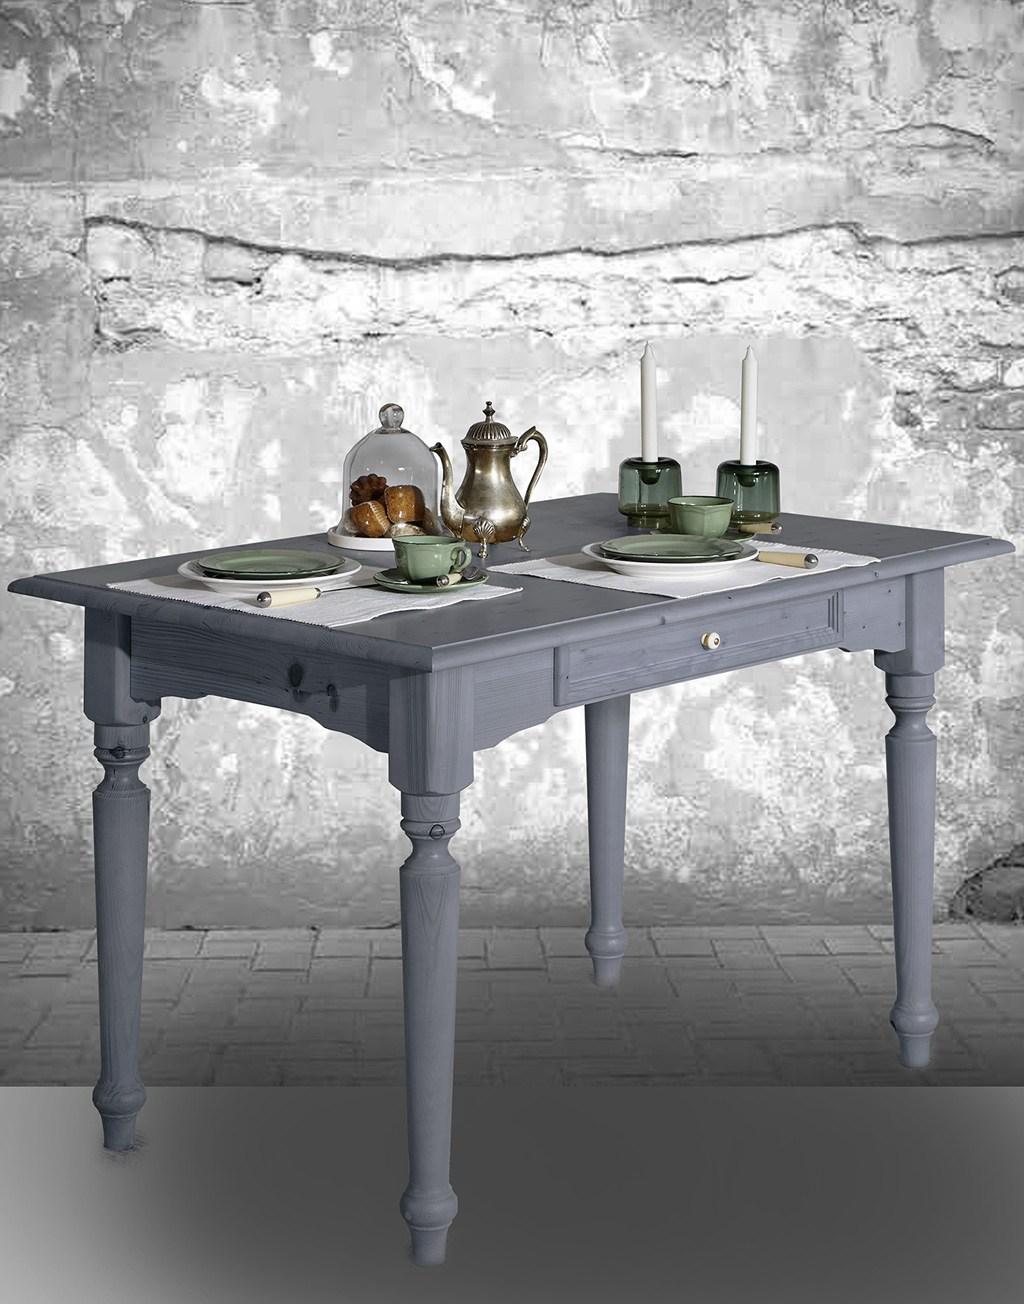 Abbildung Tisch Alina in grau.